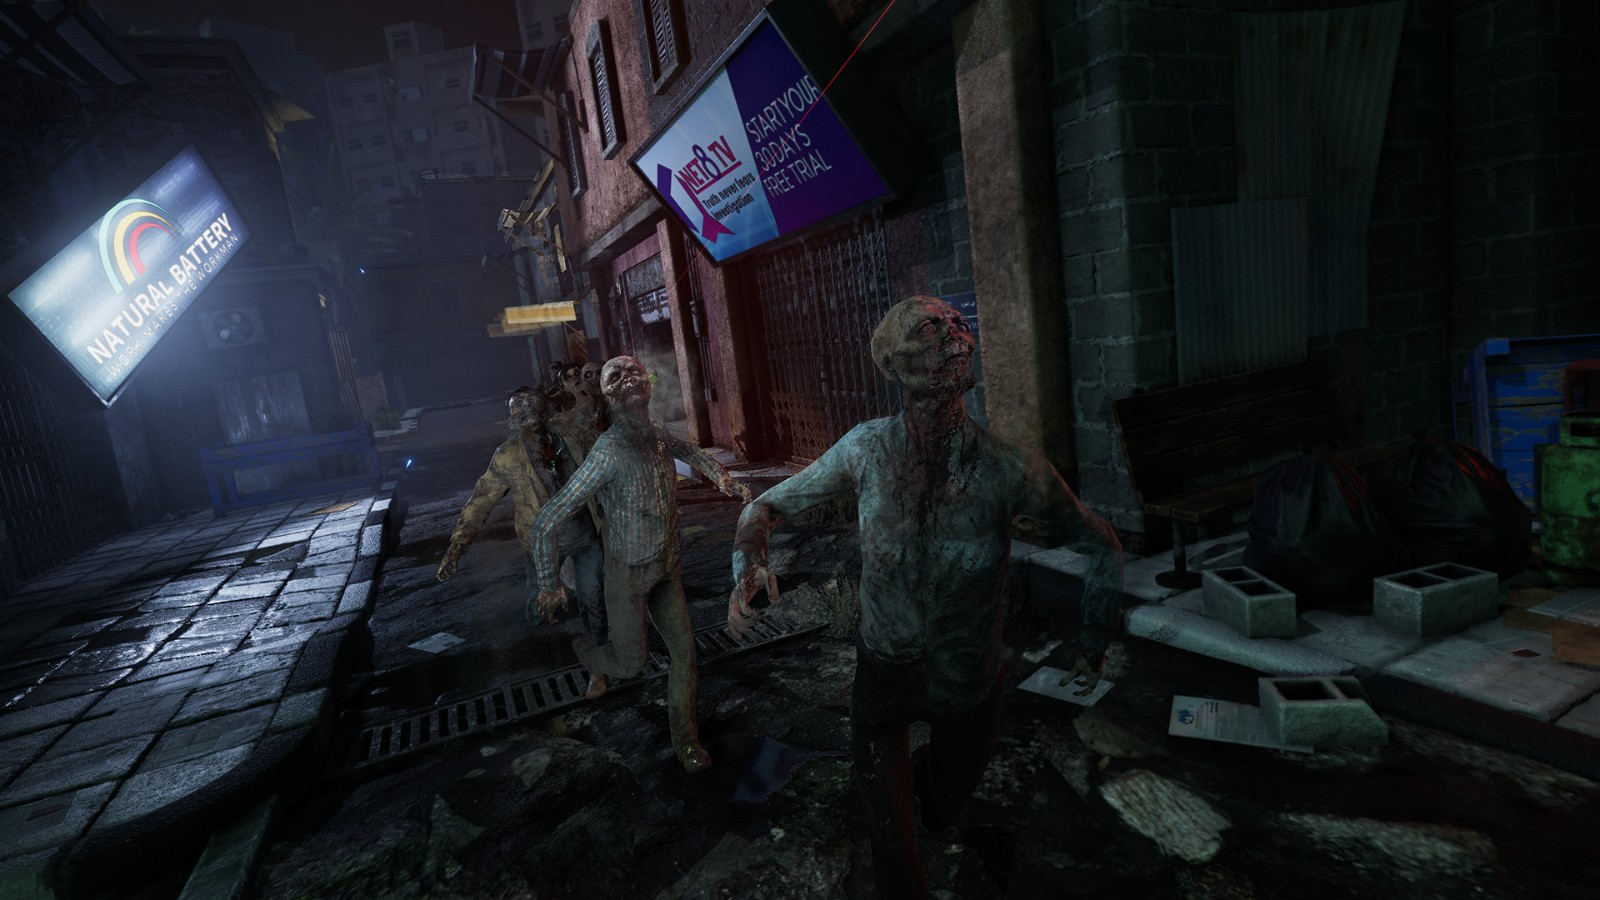 VR僵尸射击游戏《VAR: Exterminate》上架Steam 推荐GTX 1080